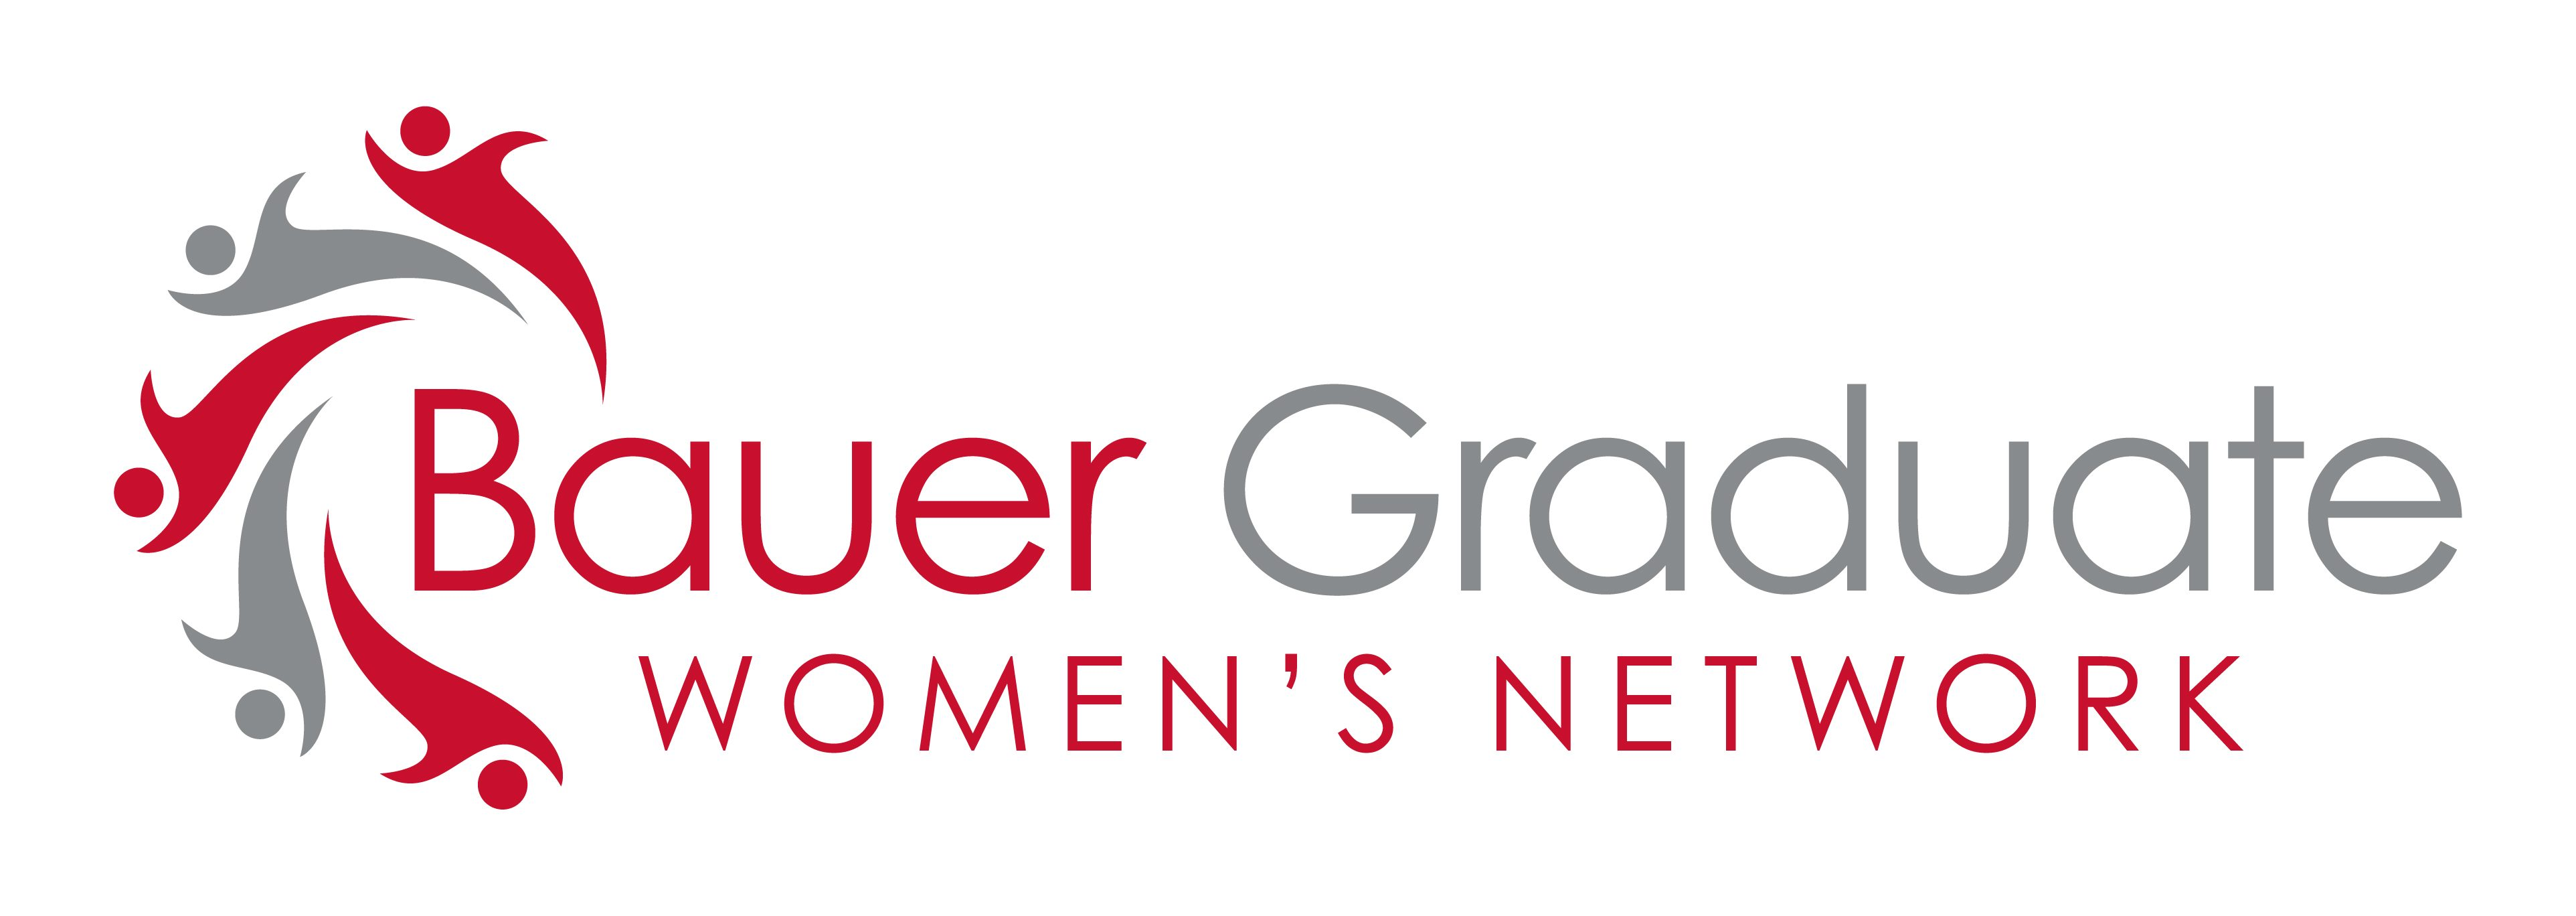 Bauer Graduate Women's Network